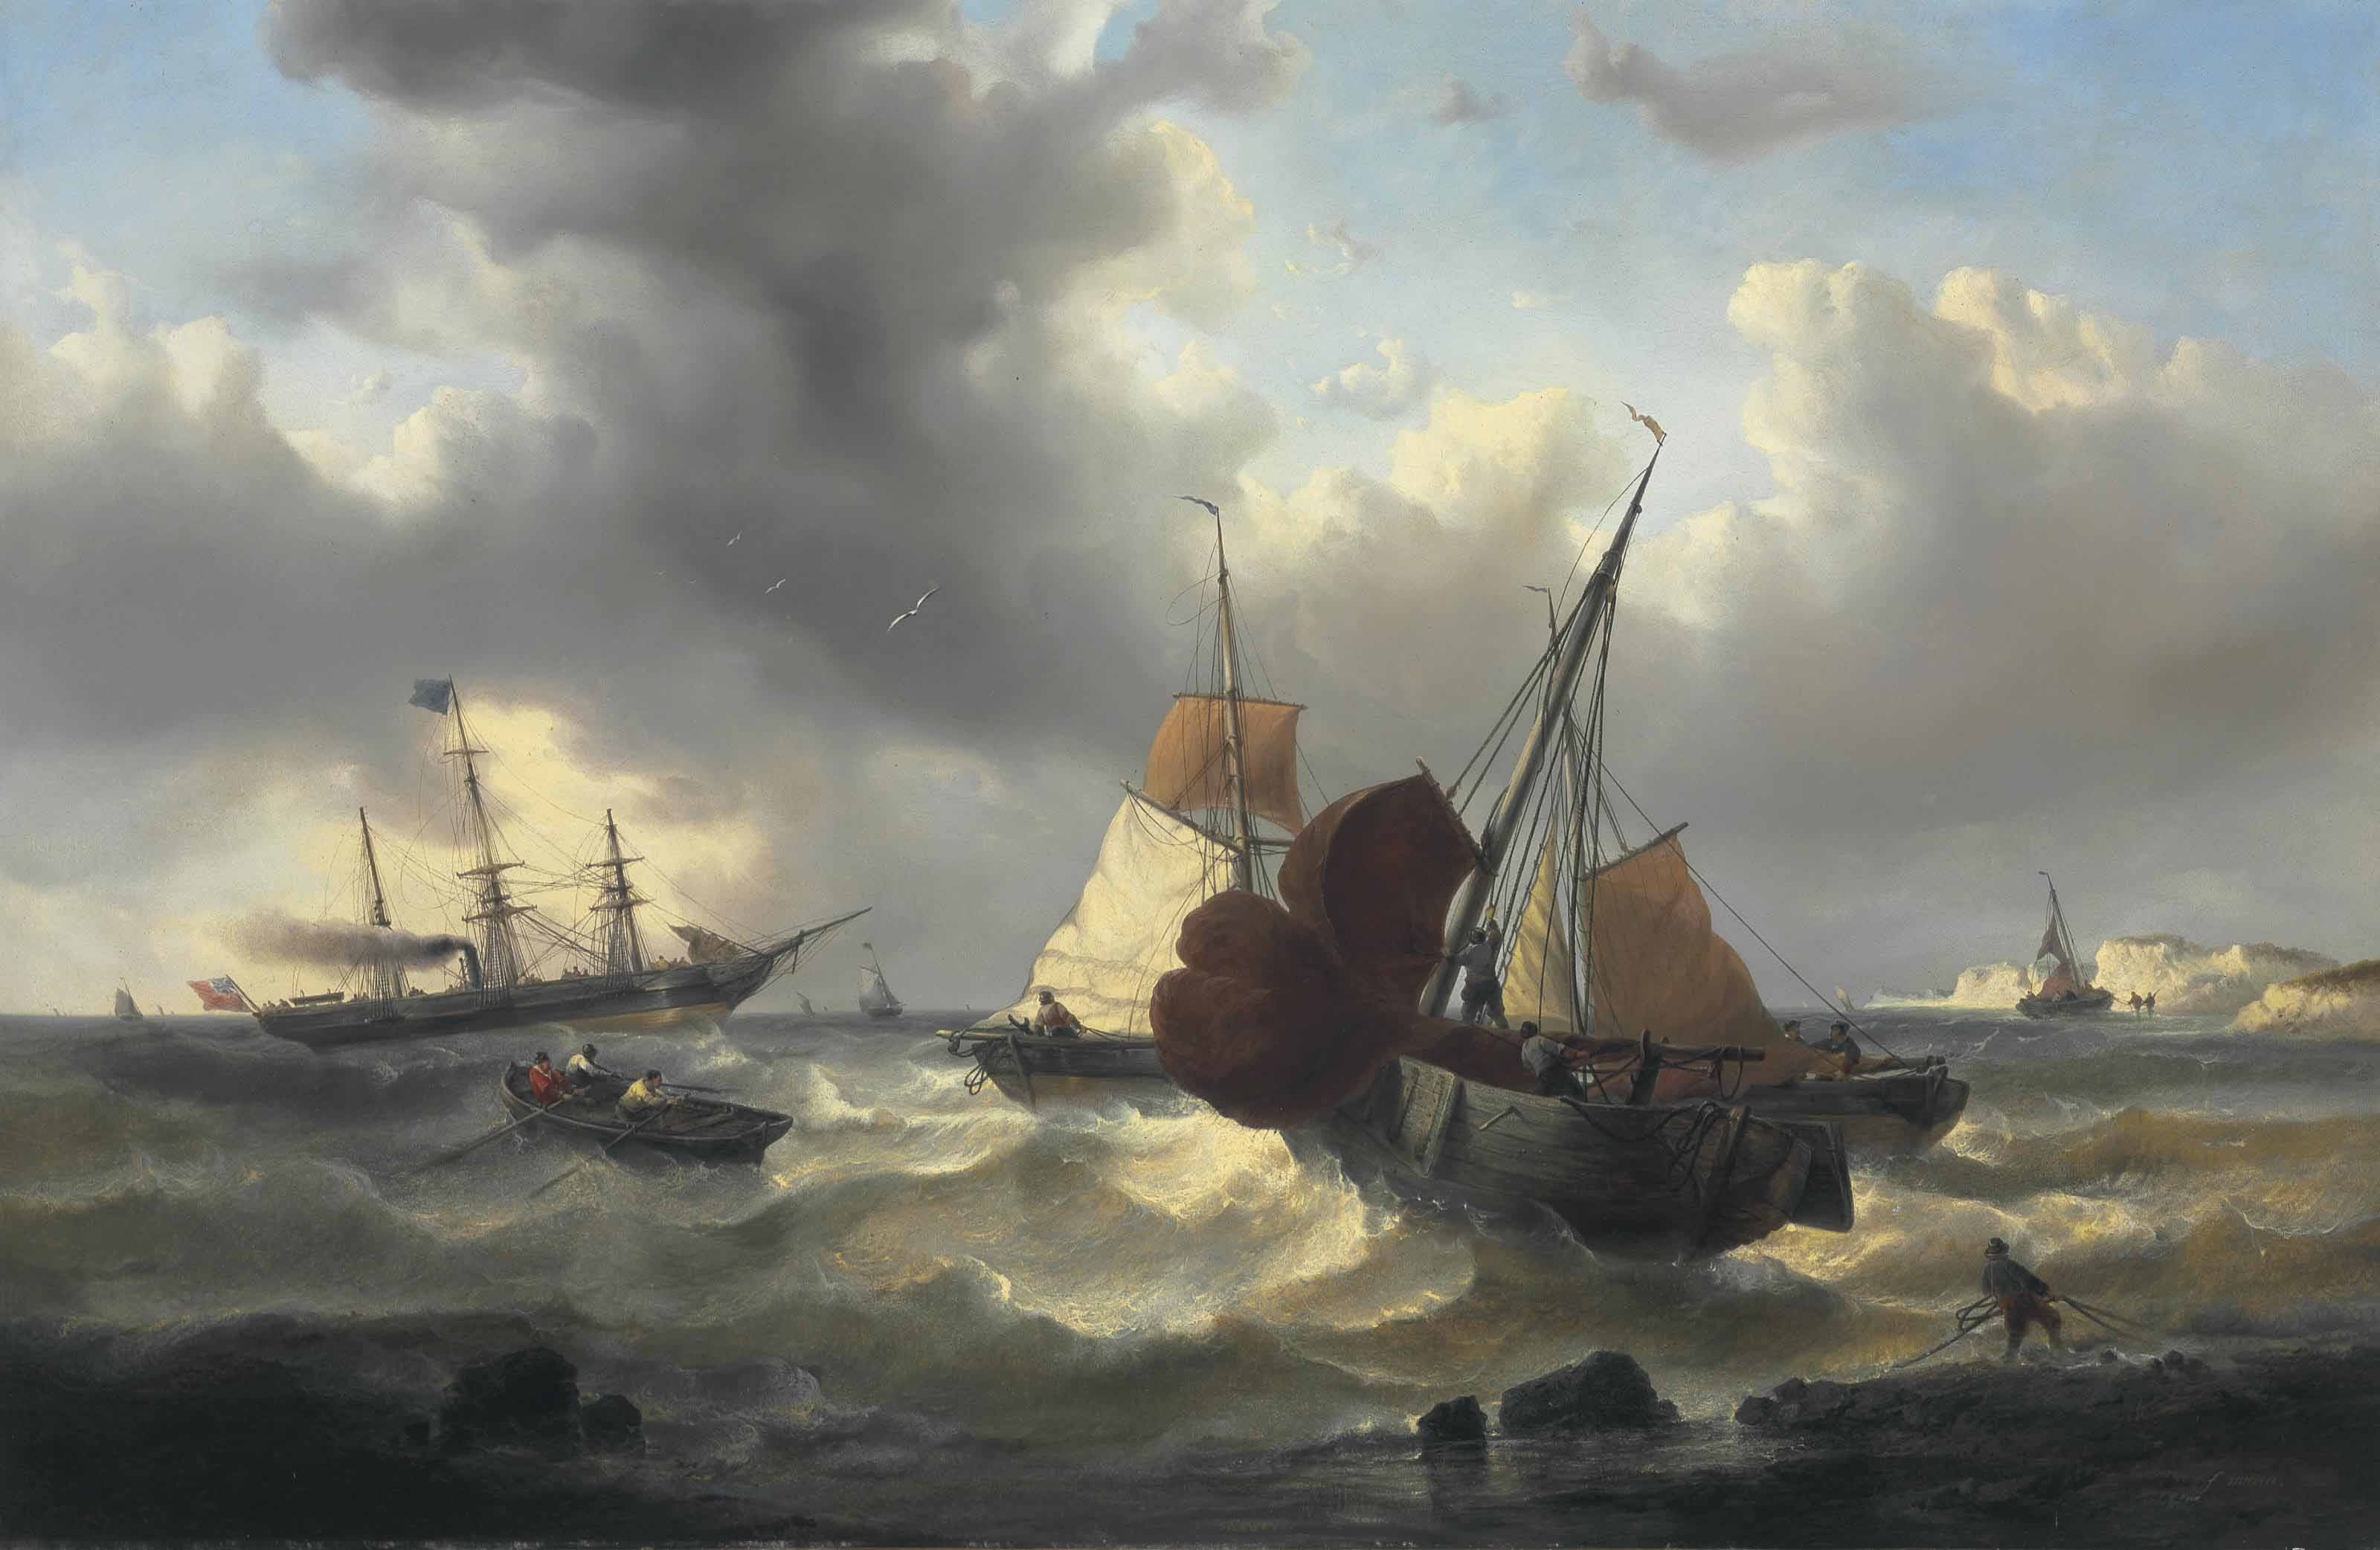 Shipping off the Coast in Choppy Seas